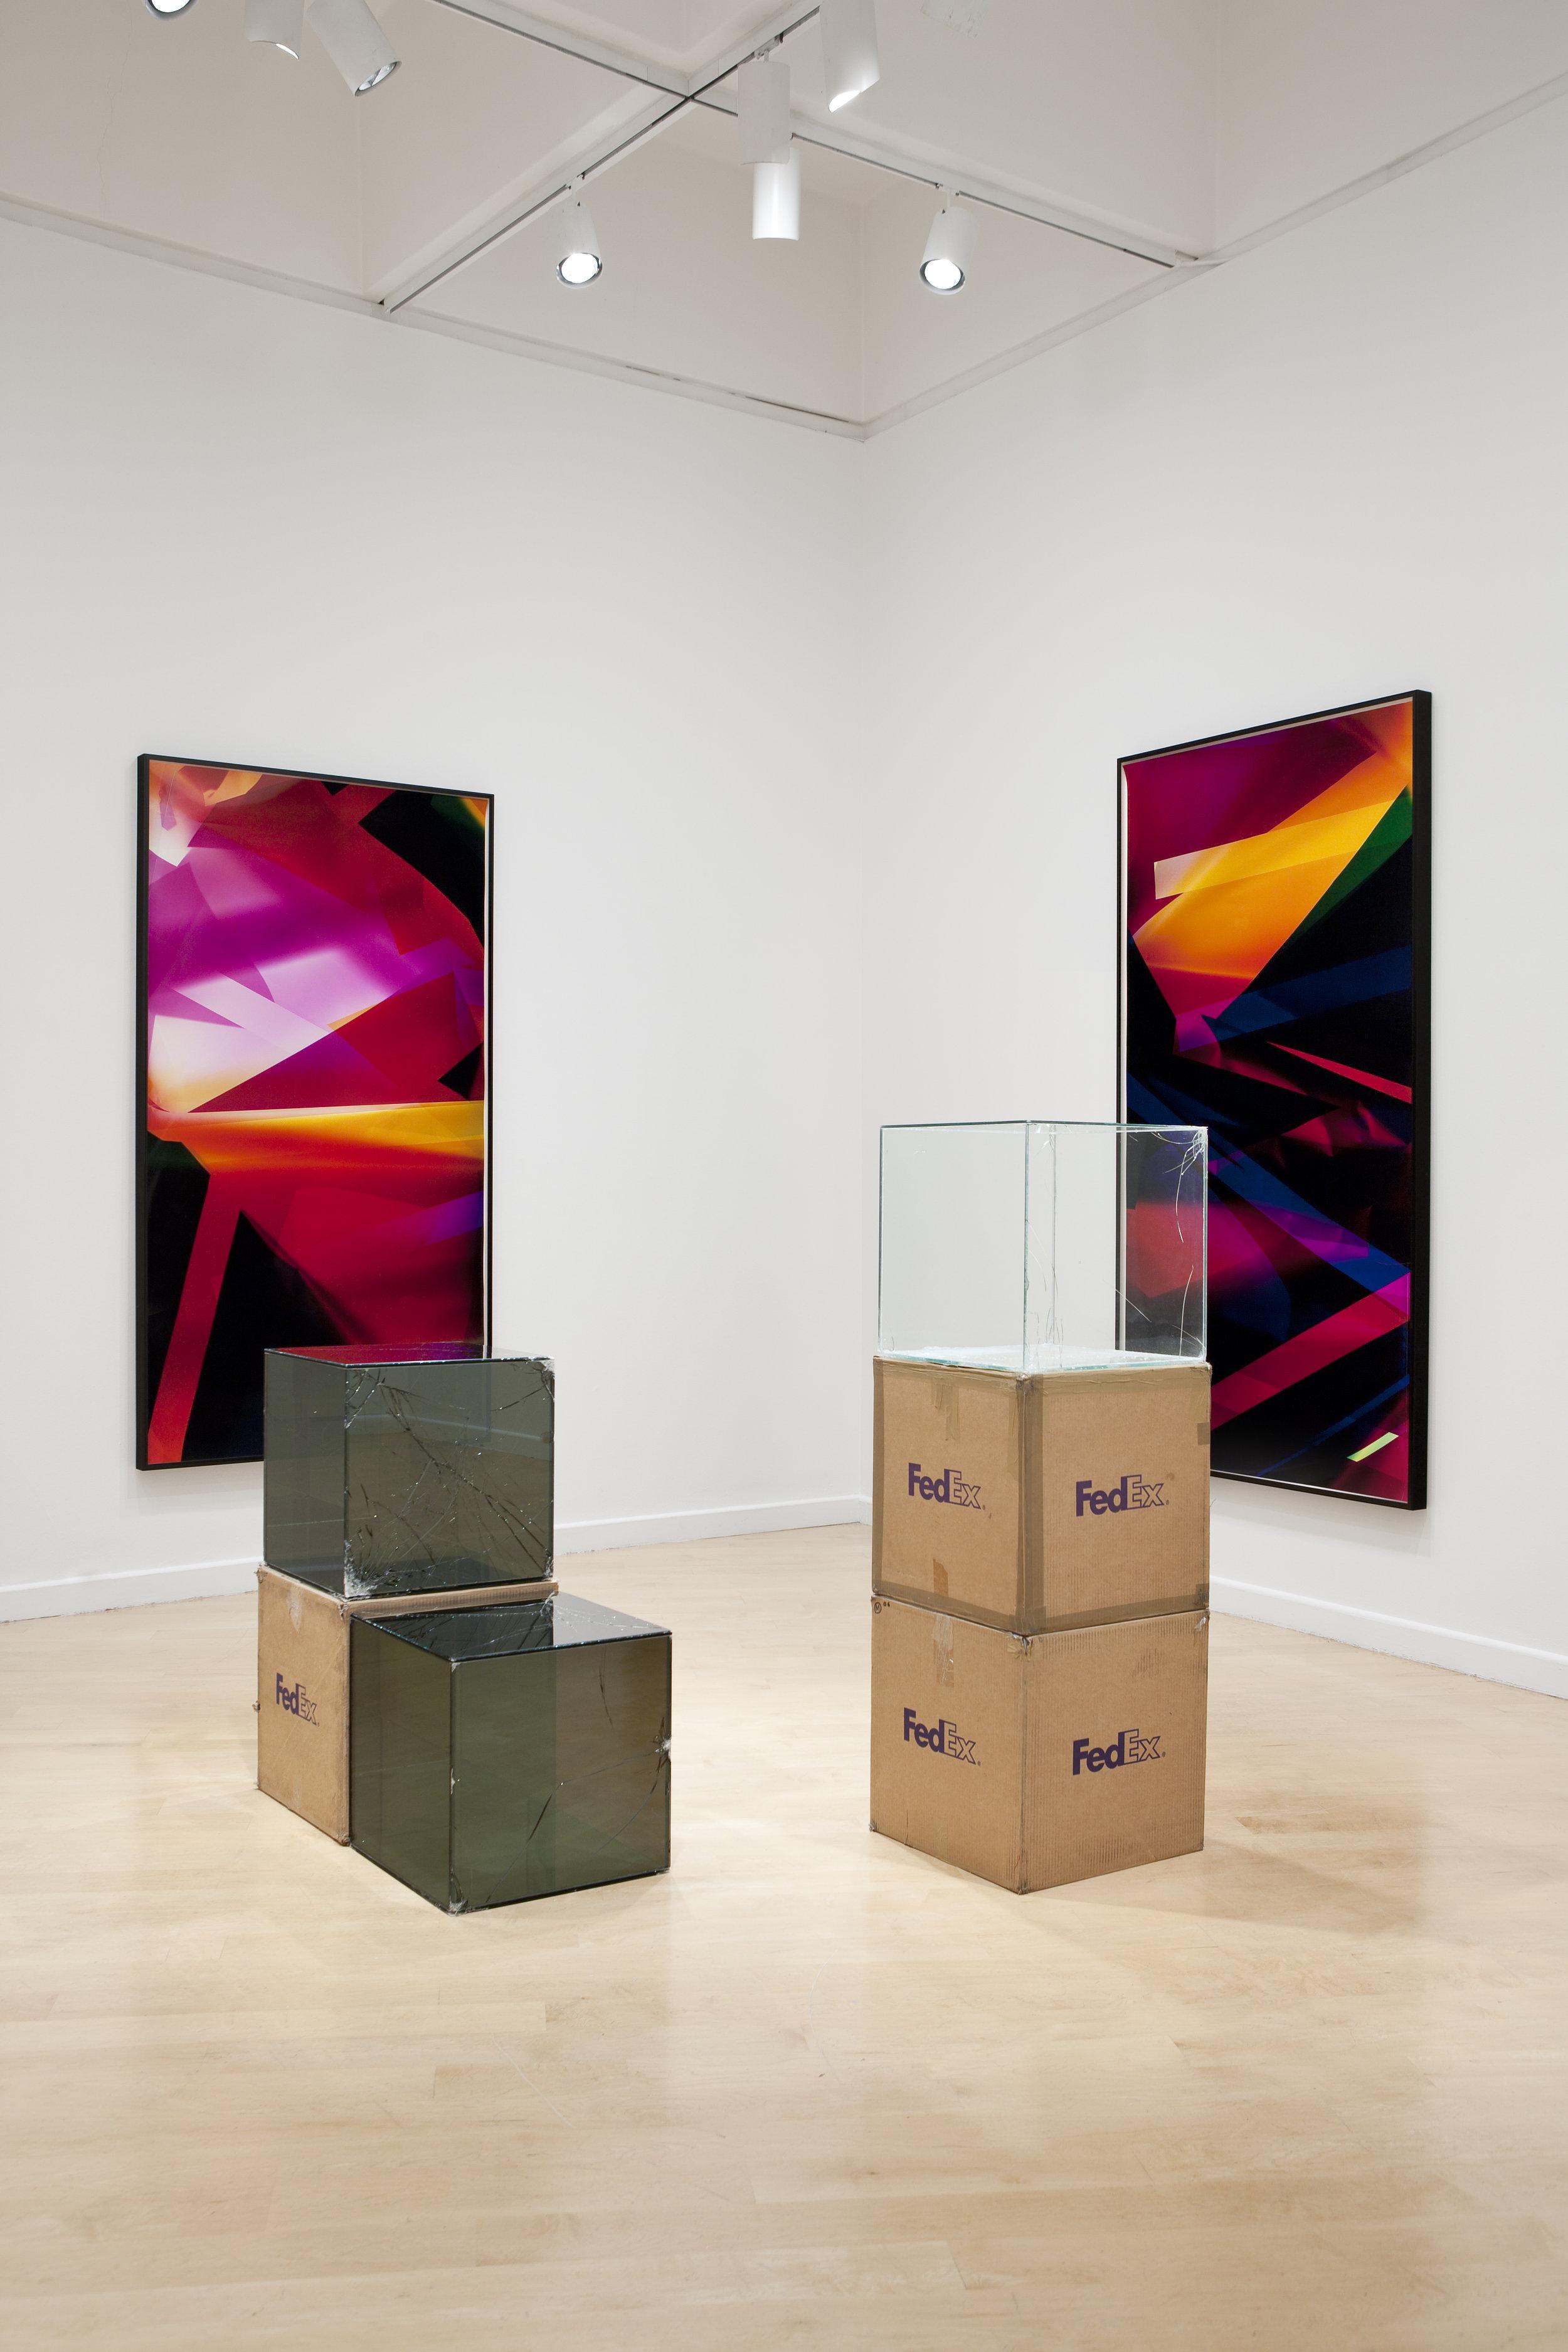 Legibility on Color Backgrounds installation, Hirshhorn Museum and Sculpture Garden, Washington, D.C., 2009